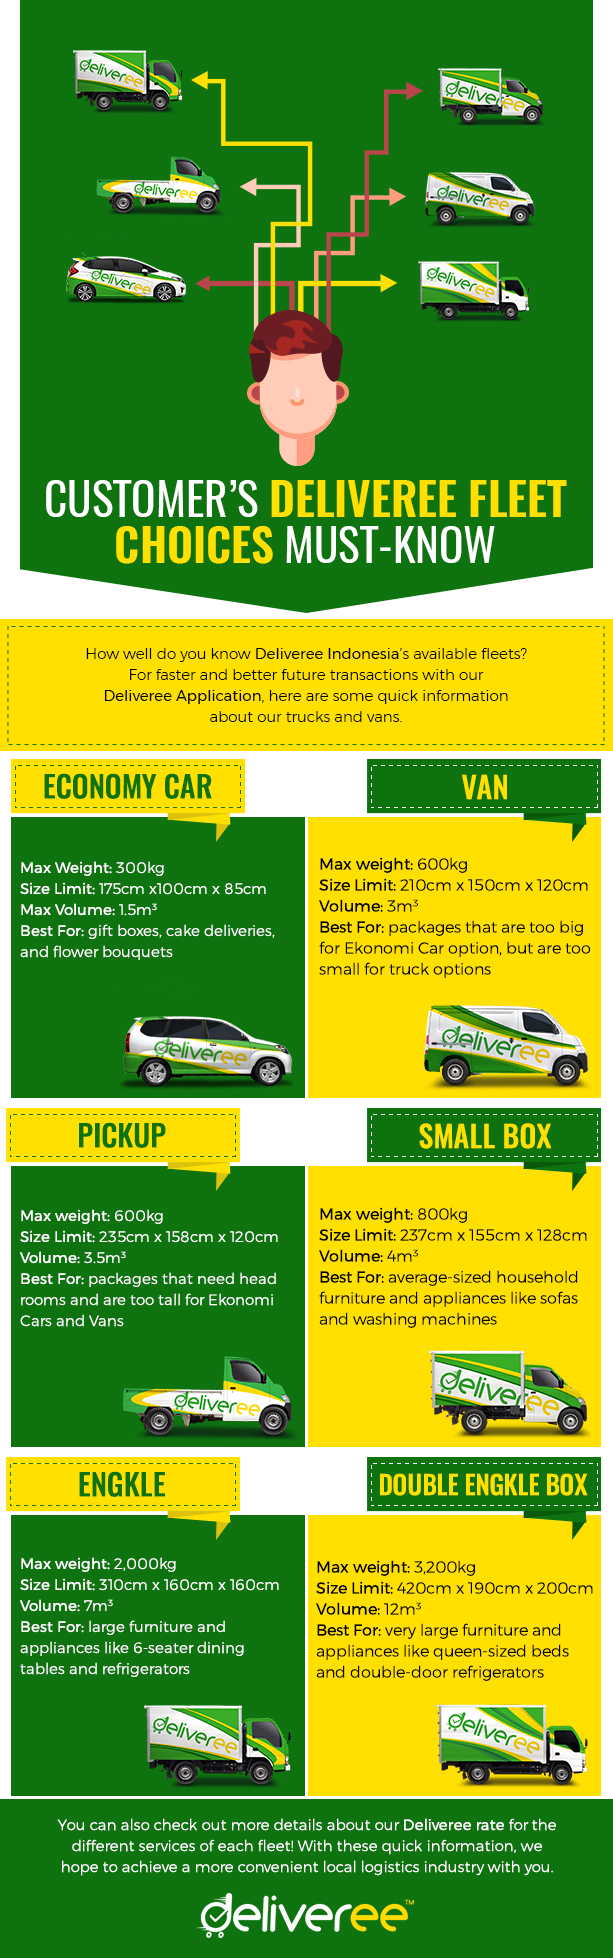 Deliveree Indonesia,deliveree,application delivereerate deliveree